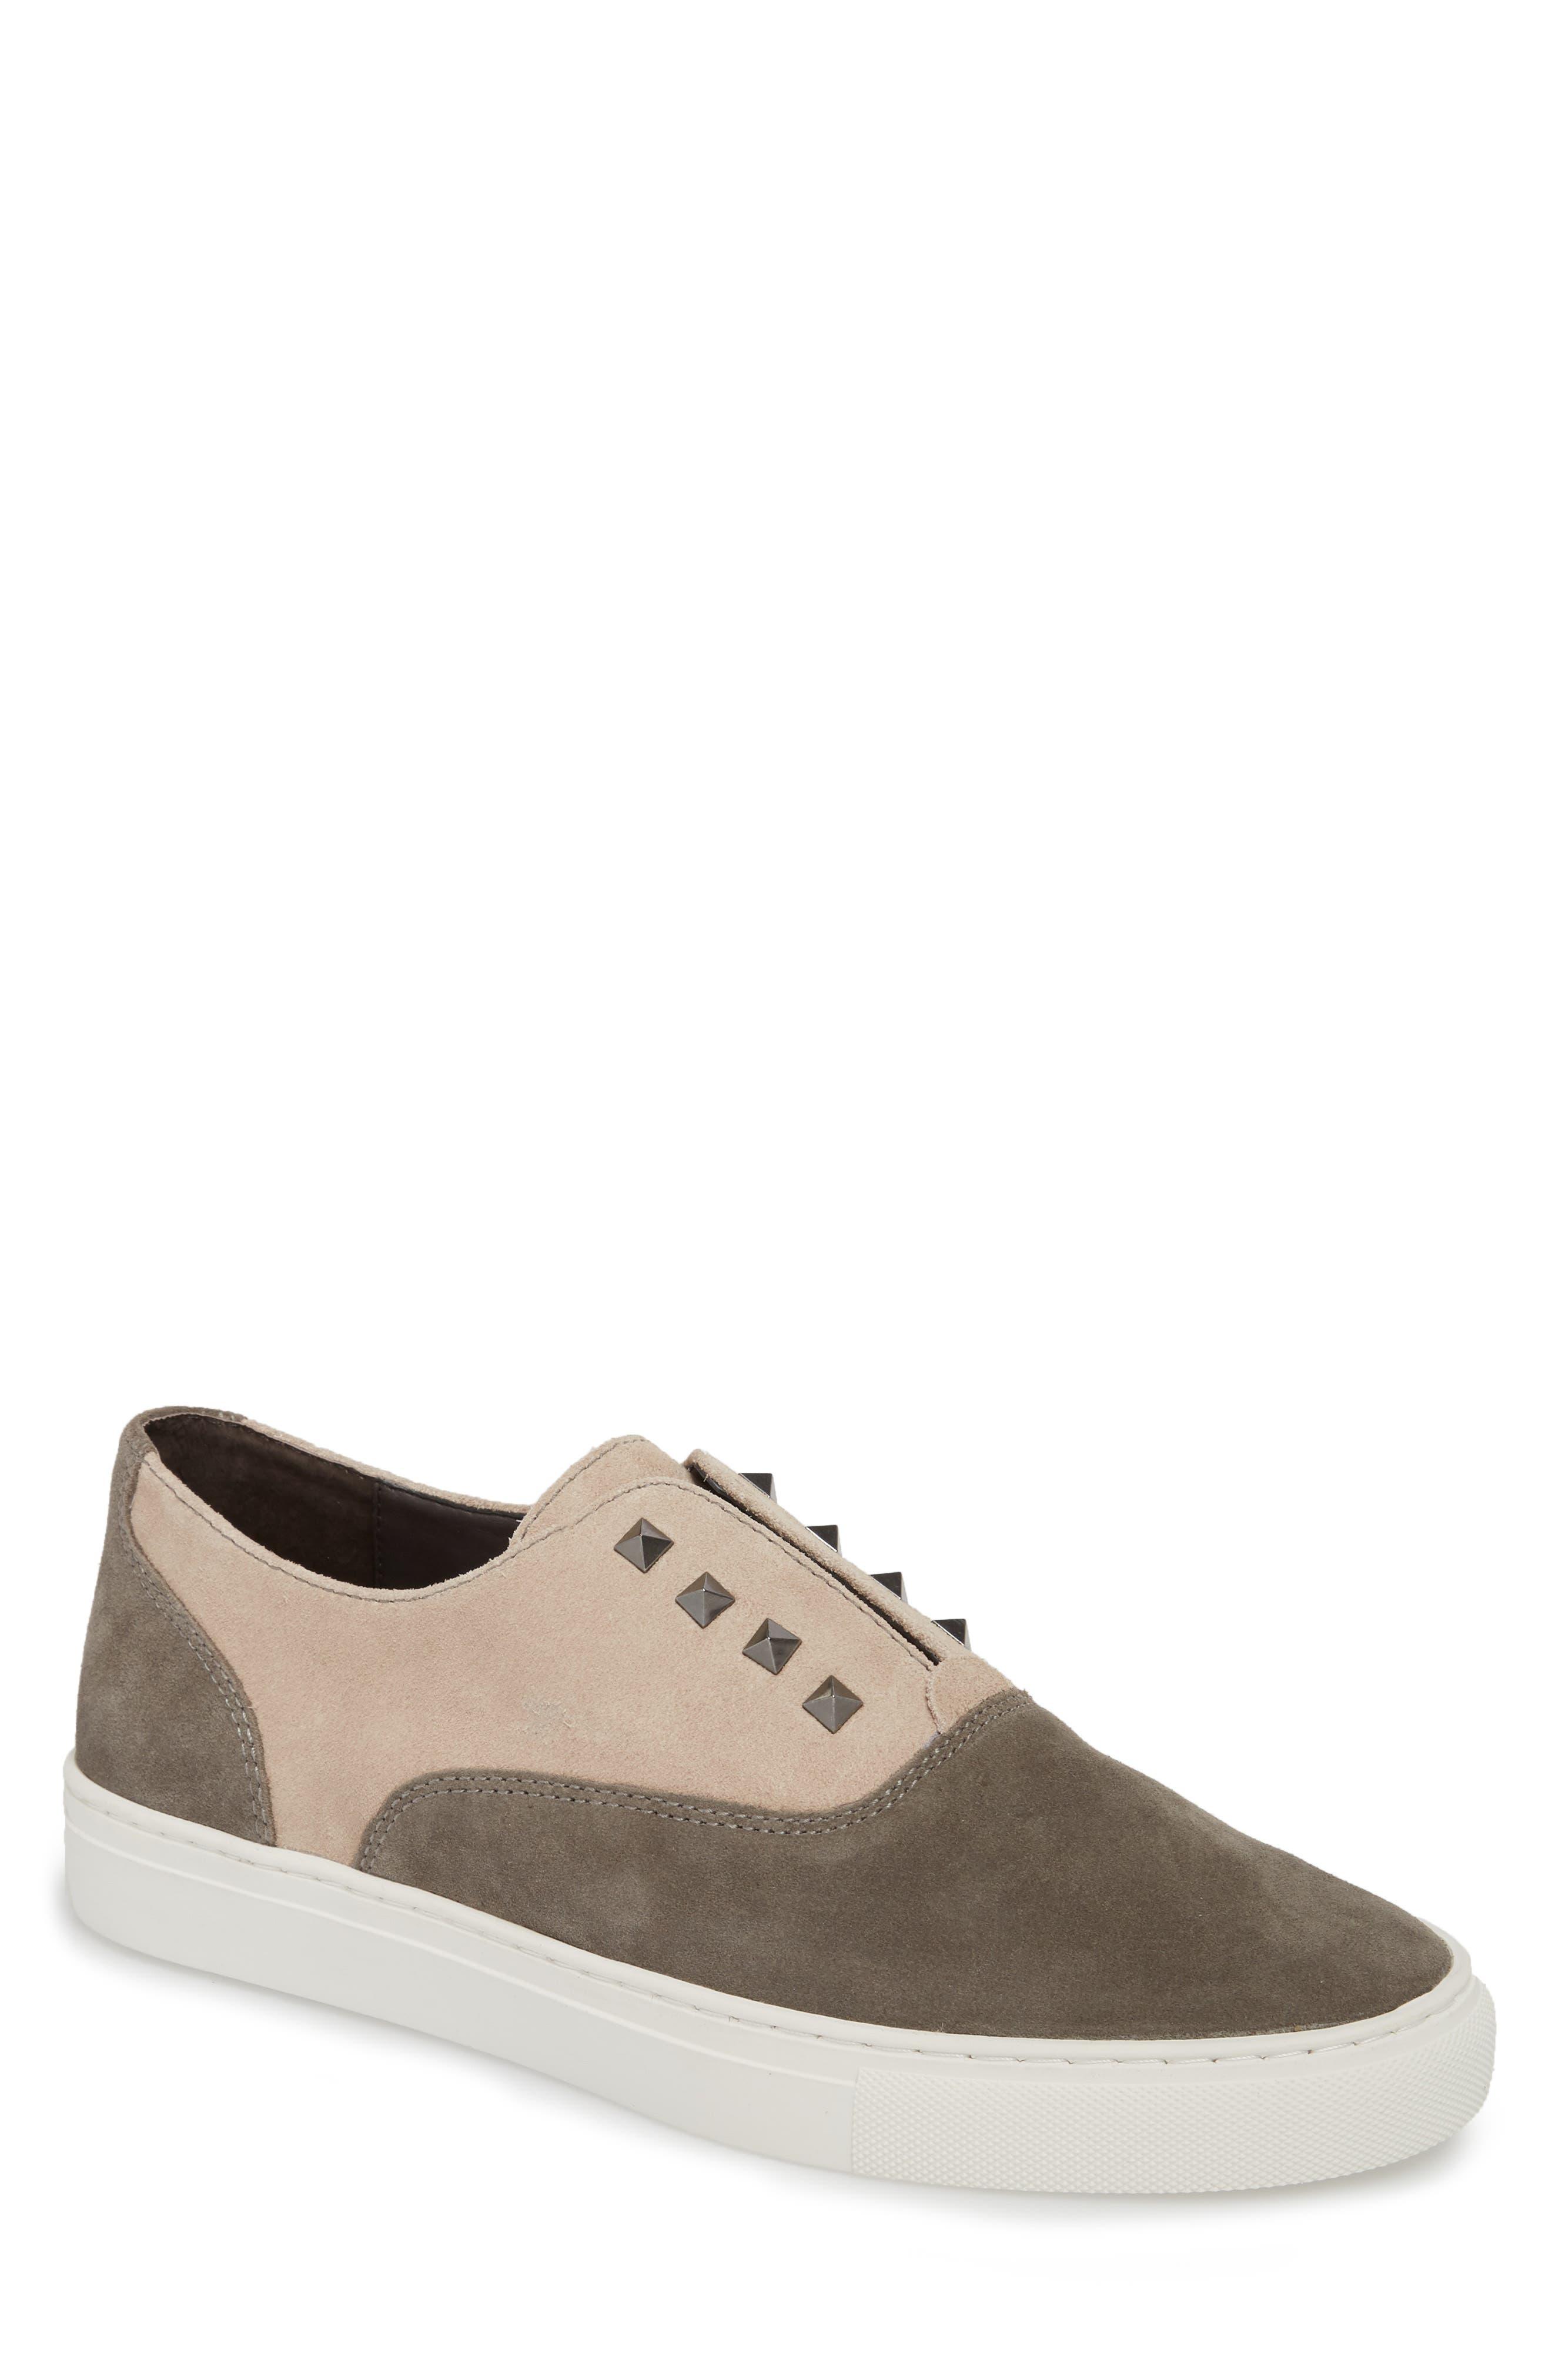 Aryo Studded Laceless Sneaker,                             Main thumbnail 2, color,